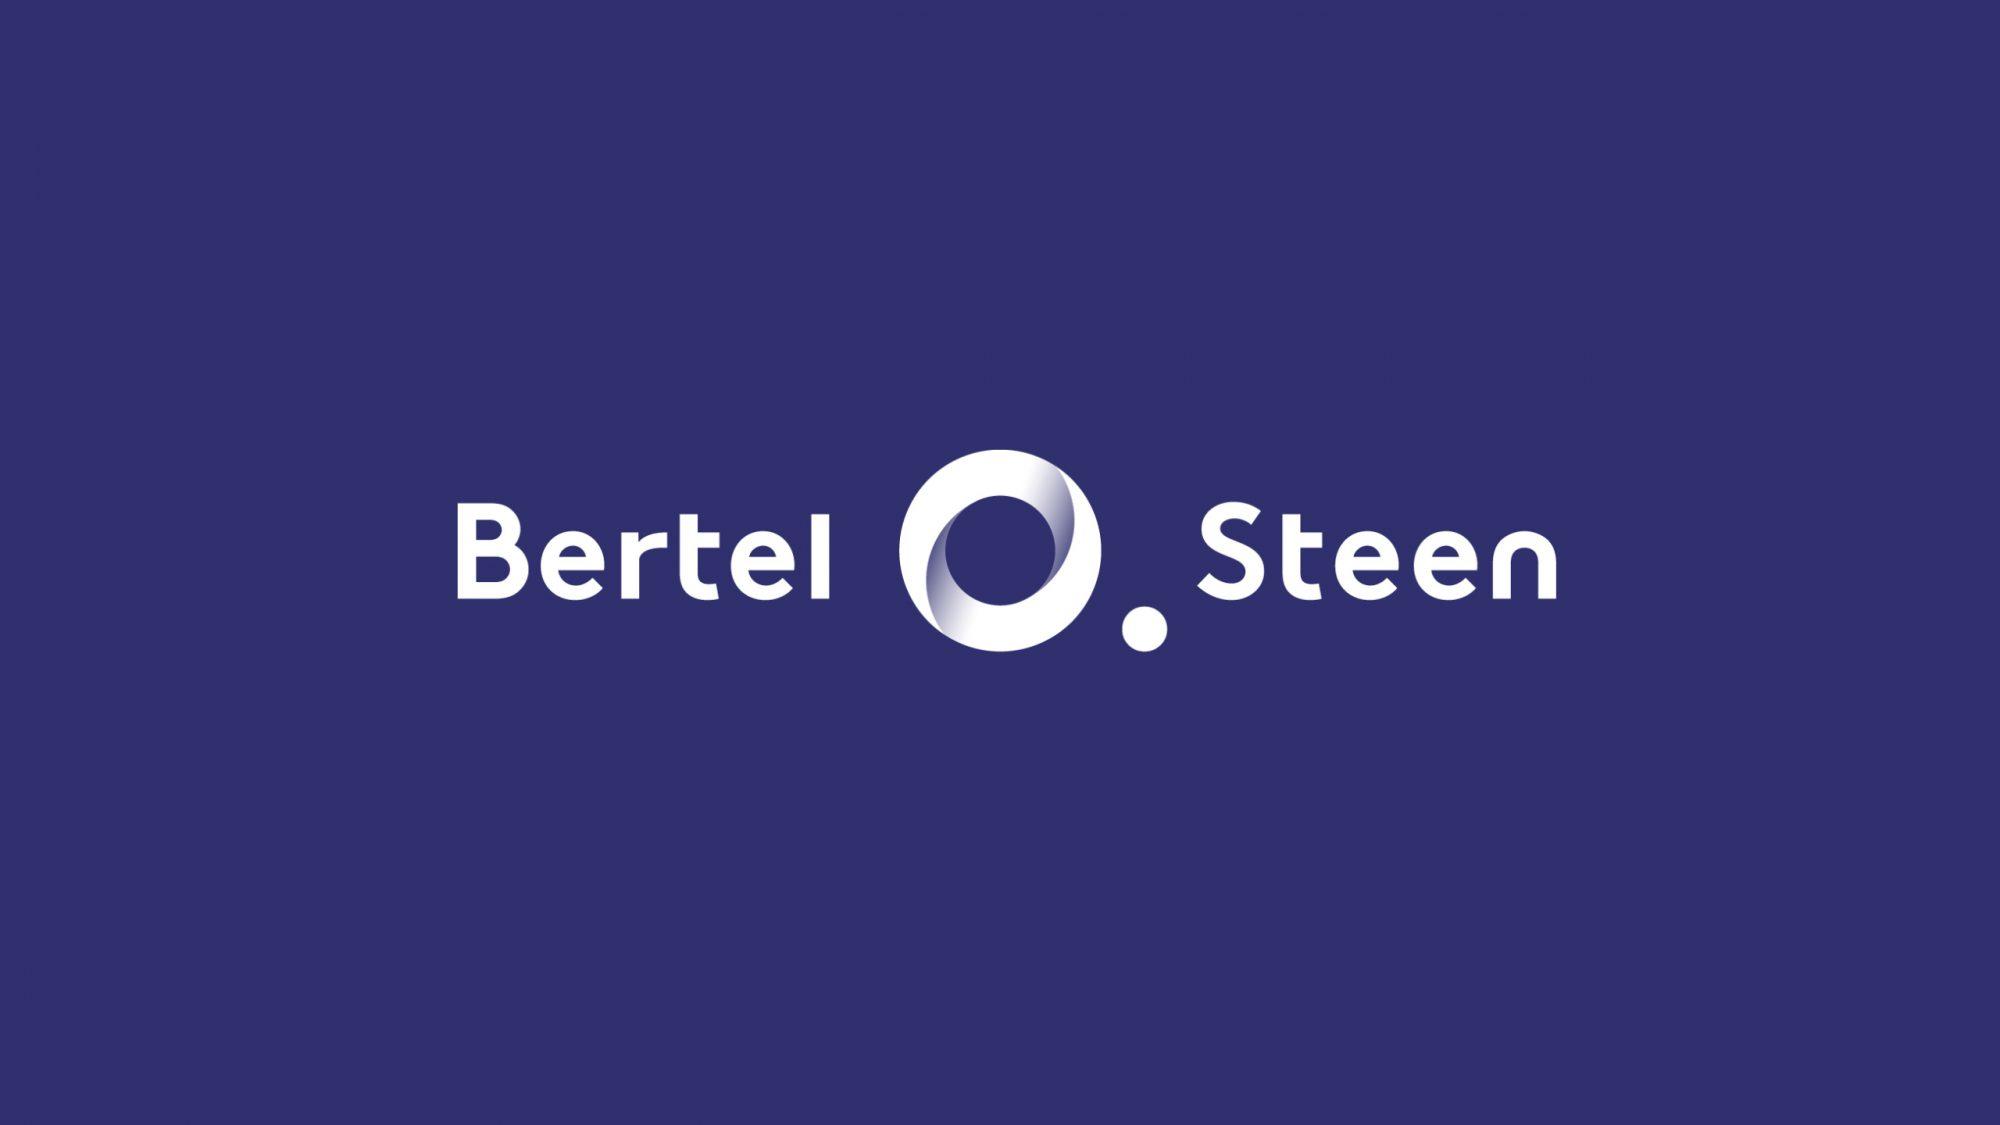 Bertel-O-Steen-logo-2000x1125